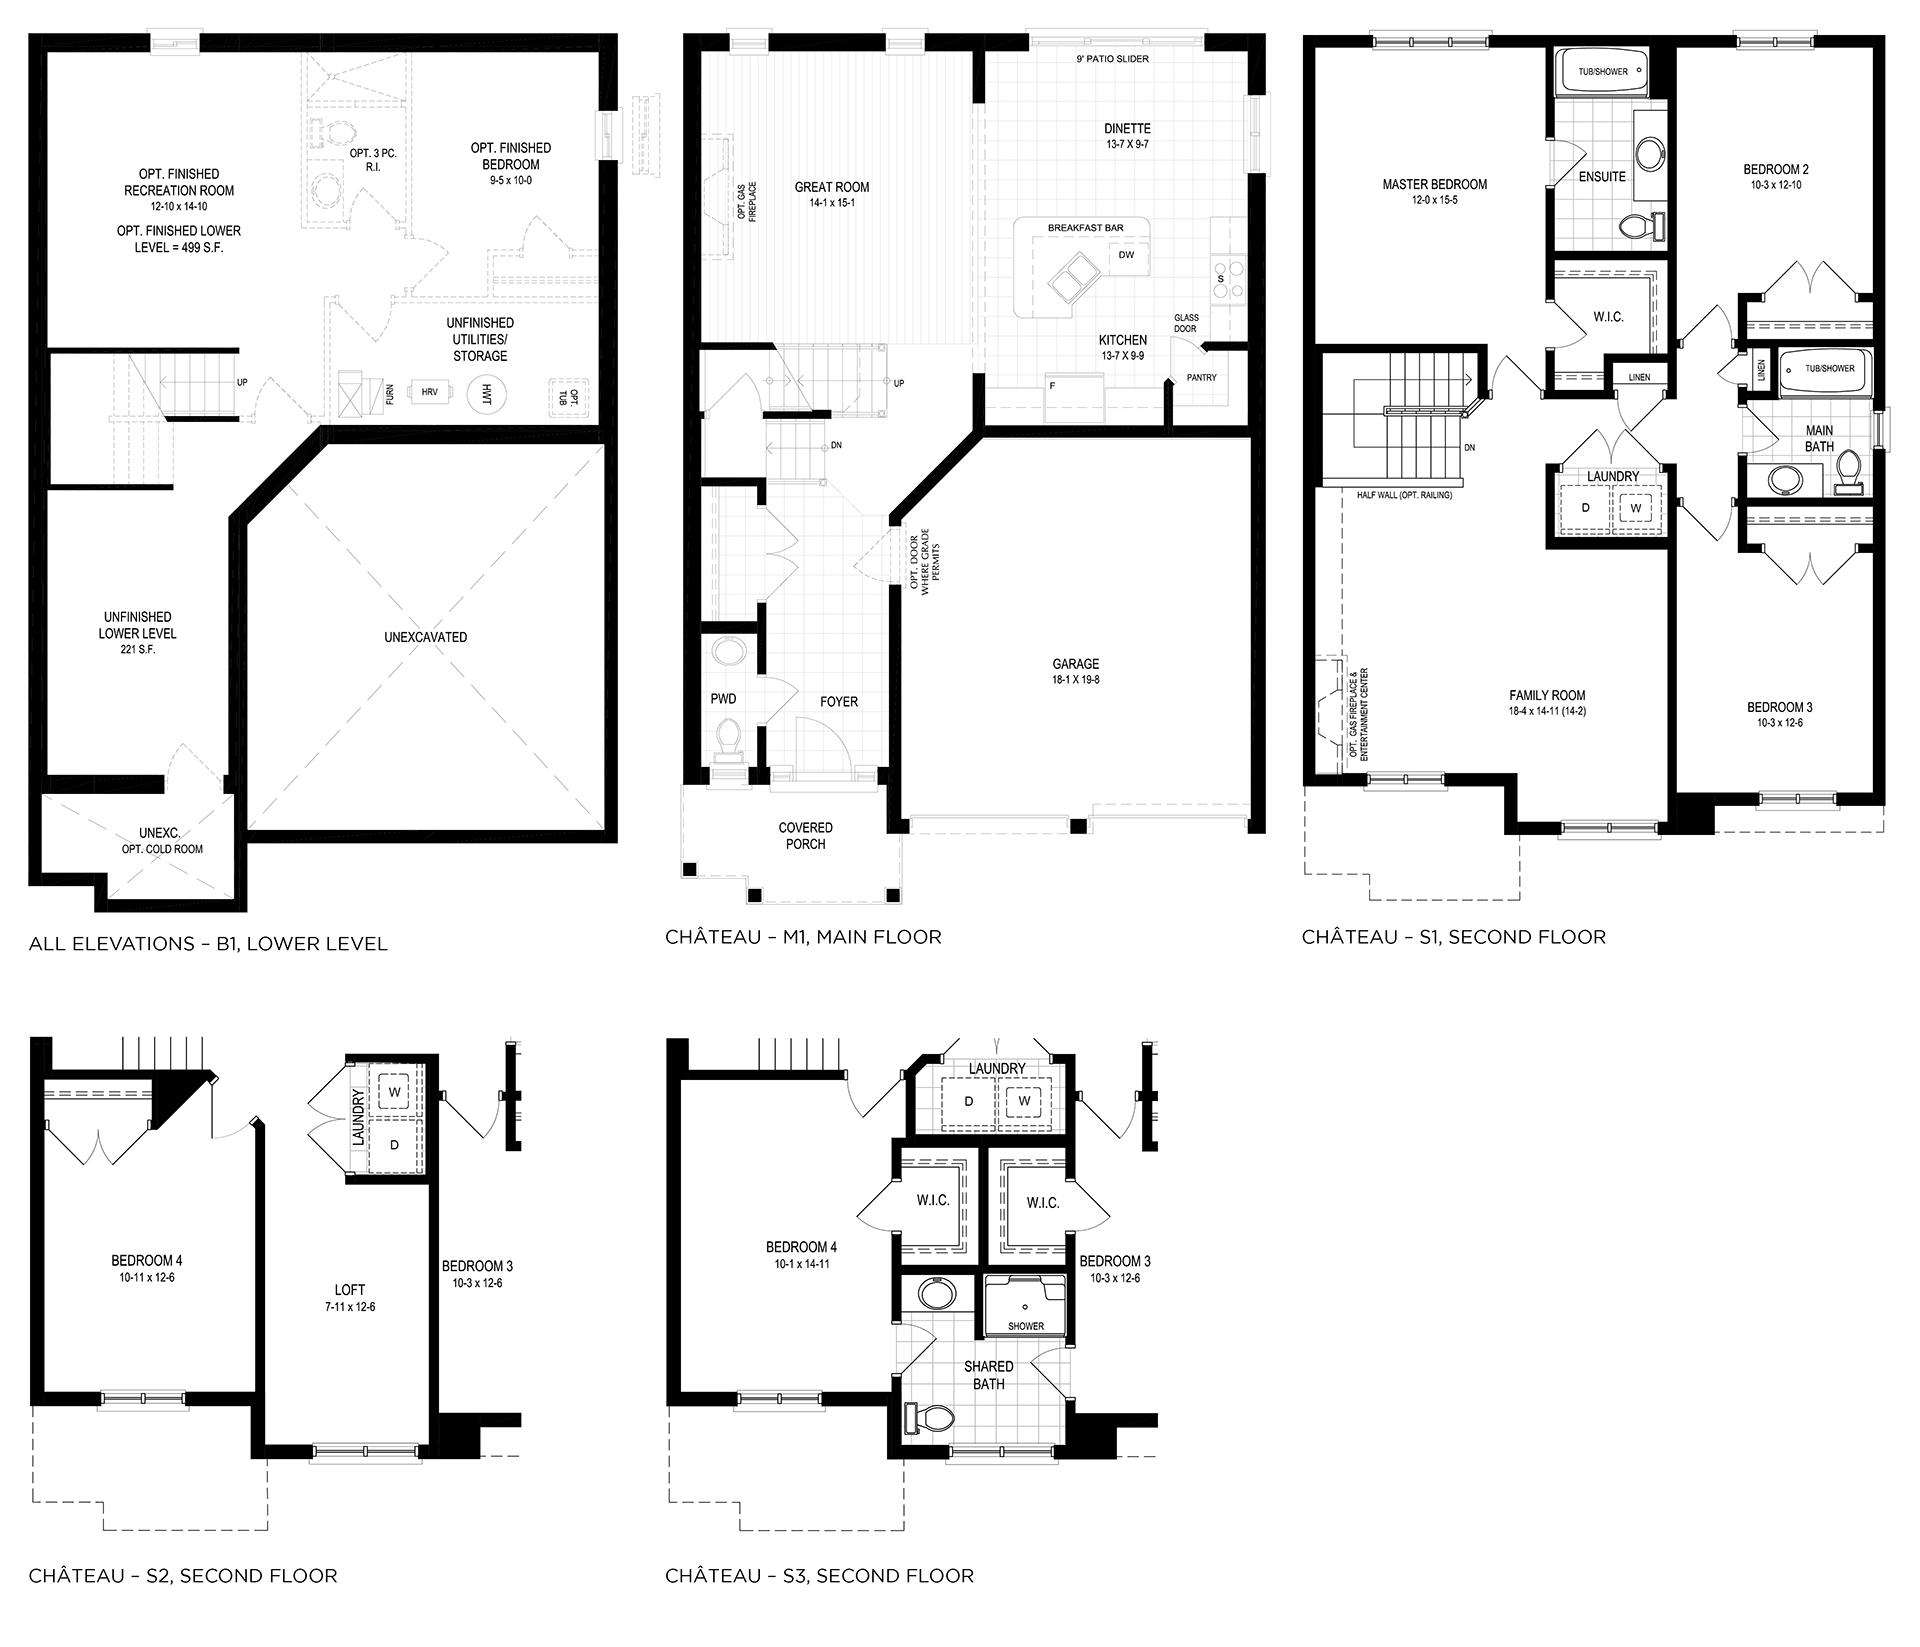 MacIntosh Floorplan